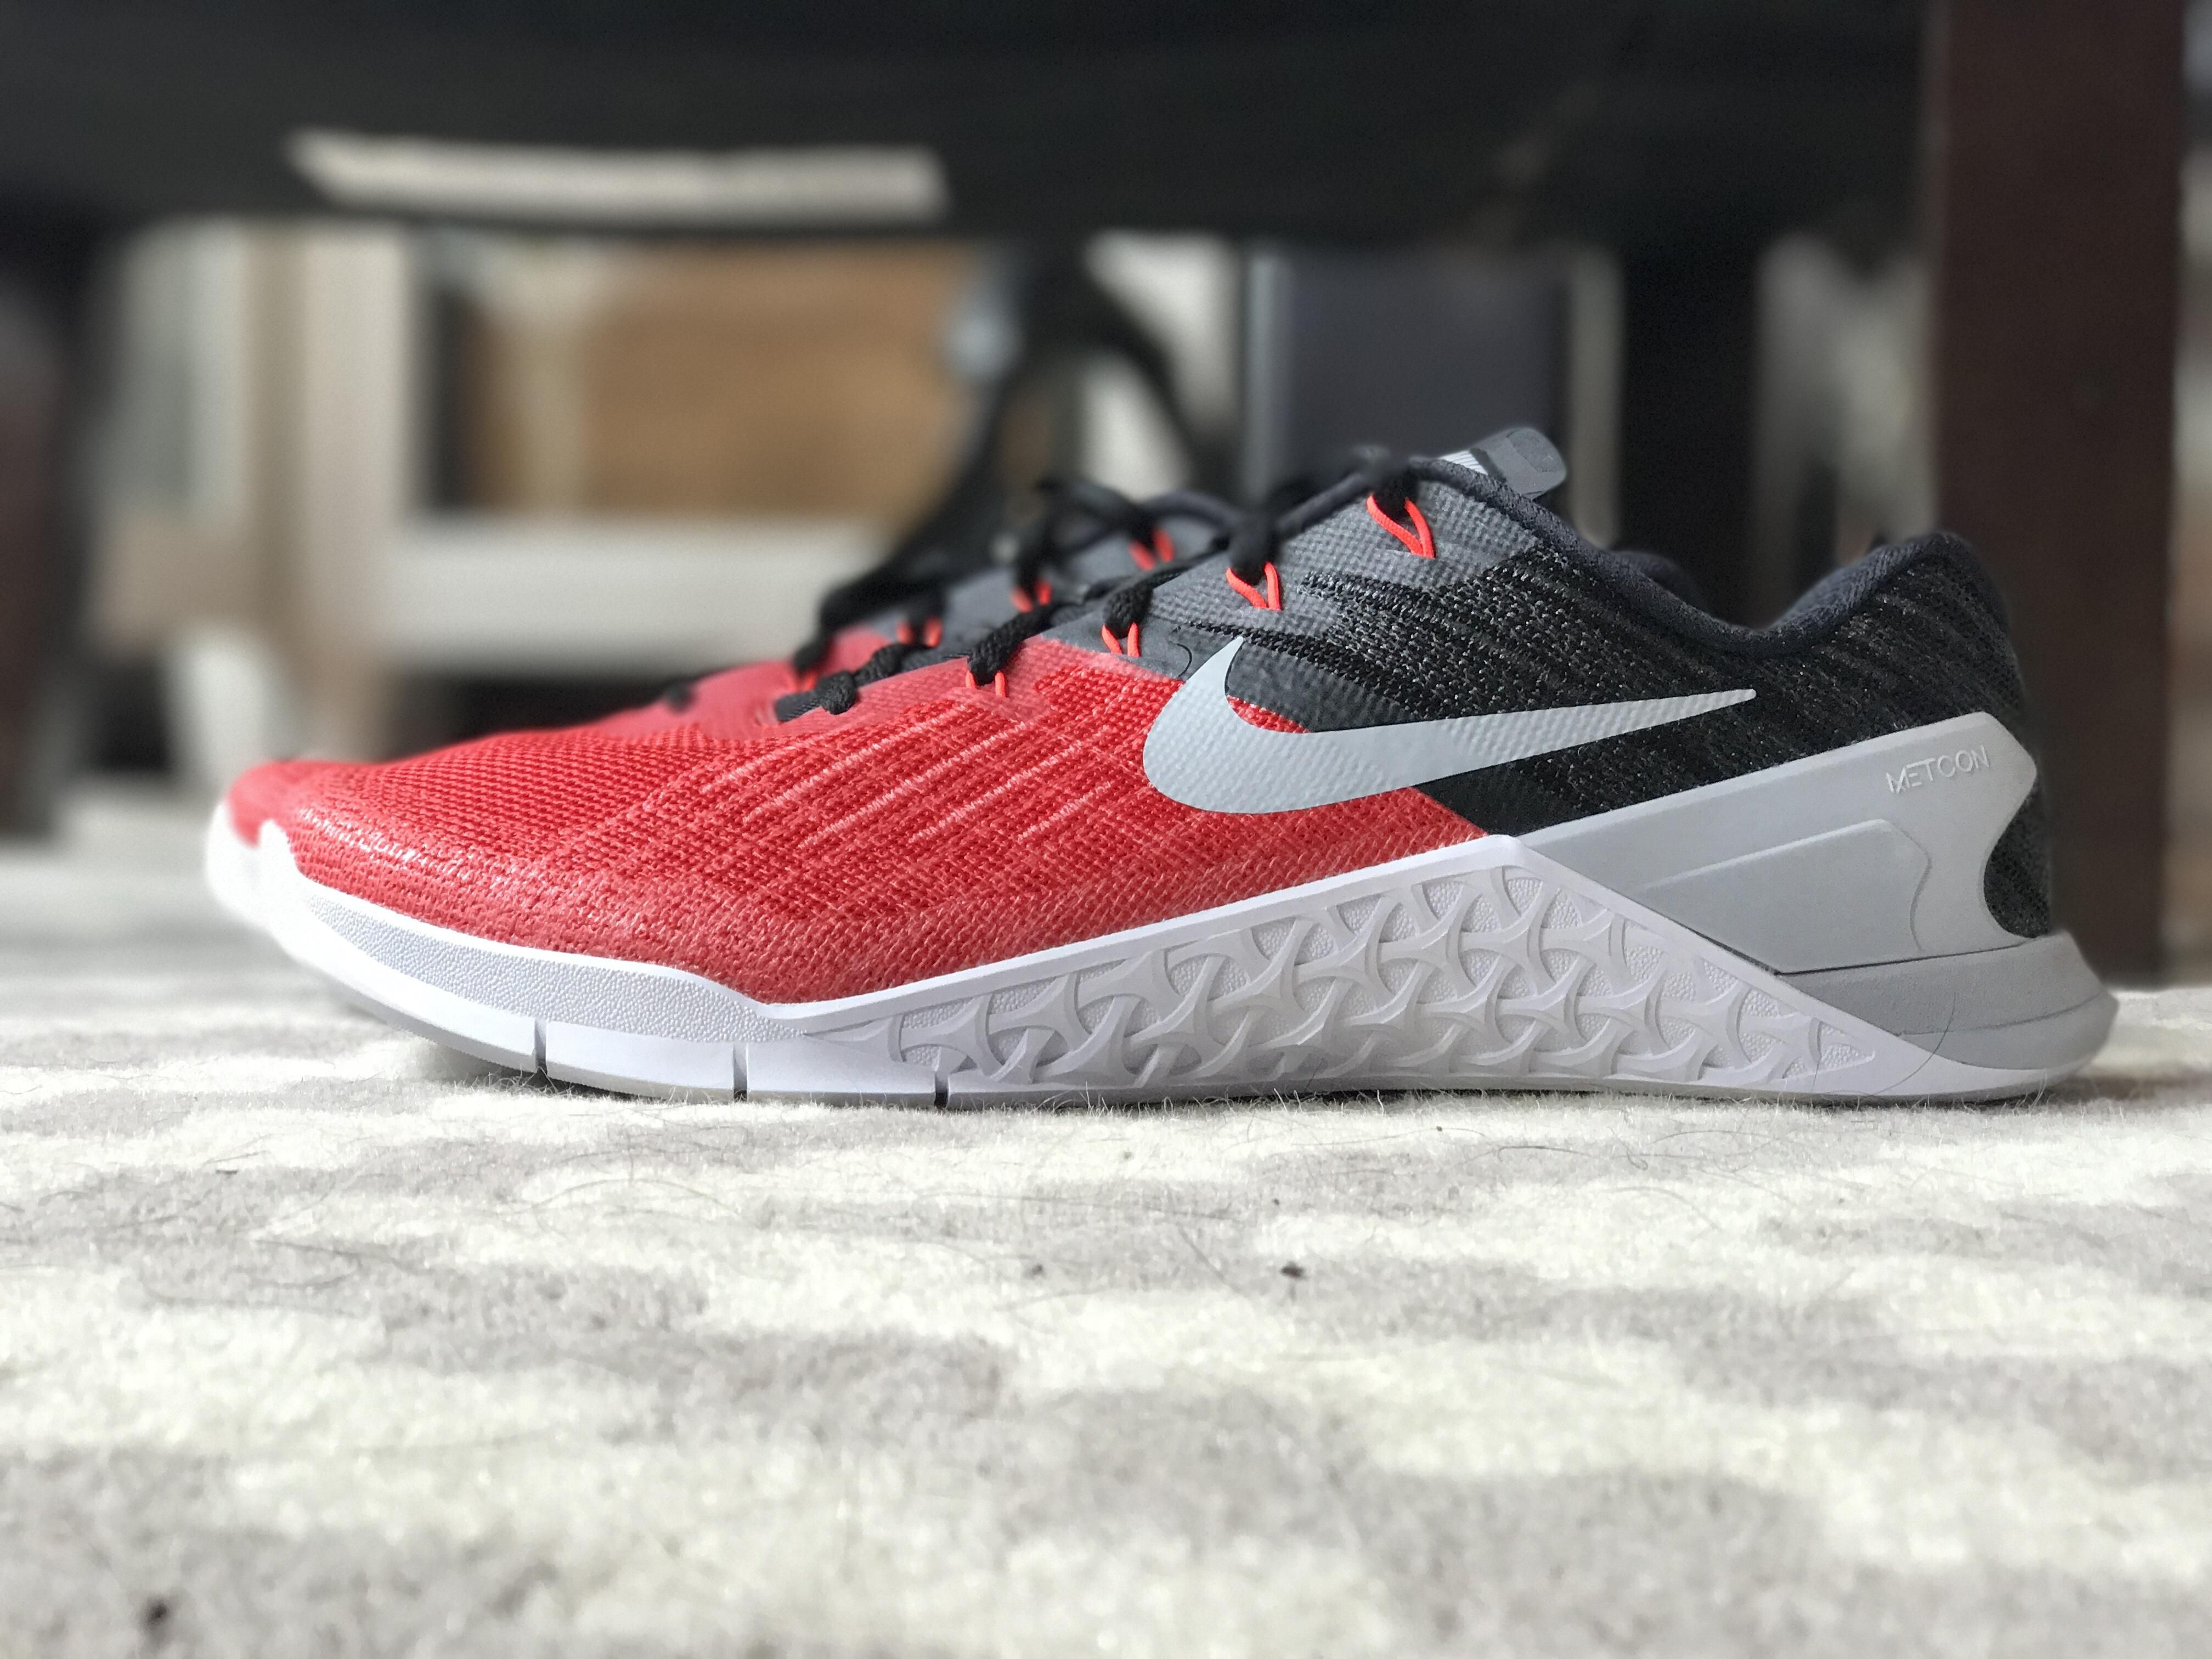 Pickup] Nike Metcon 3 Metcon Pinterest